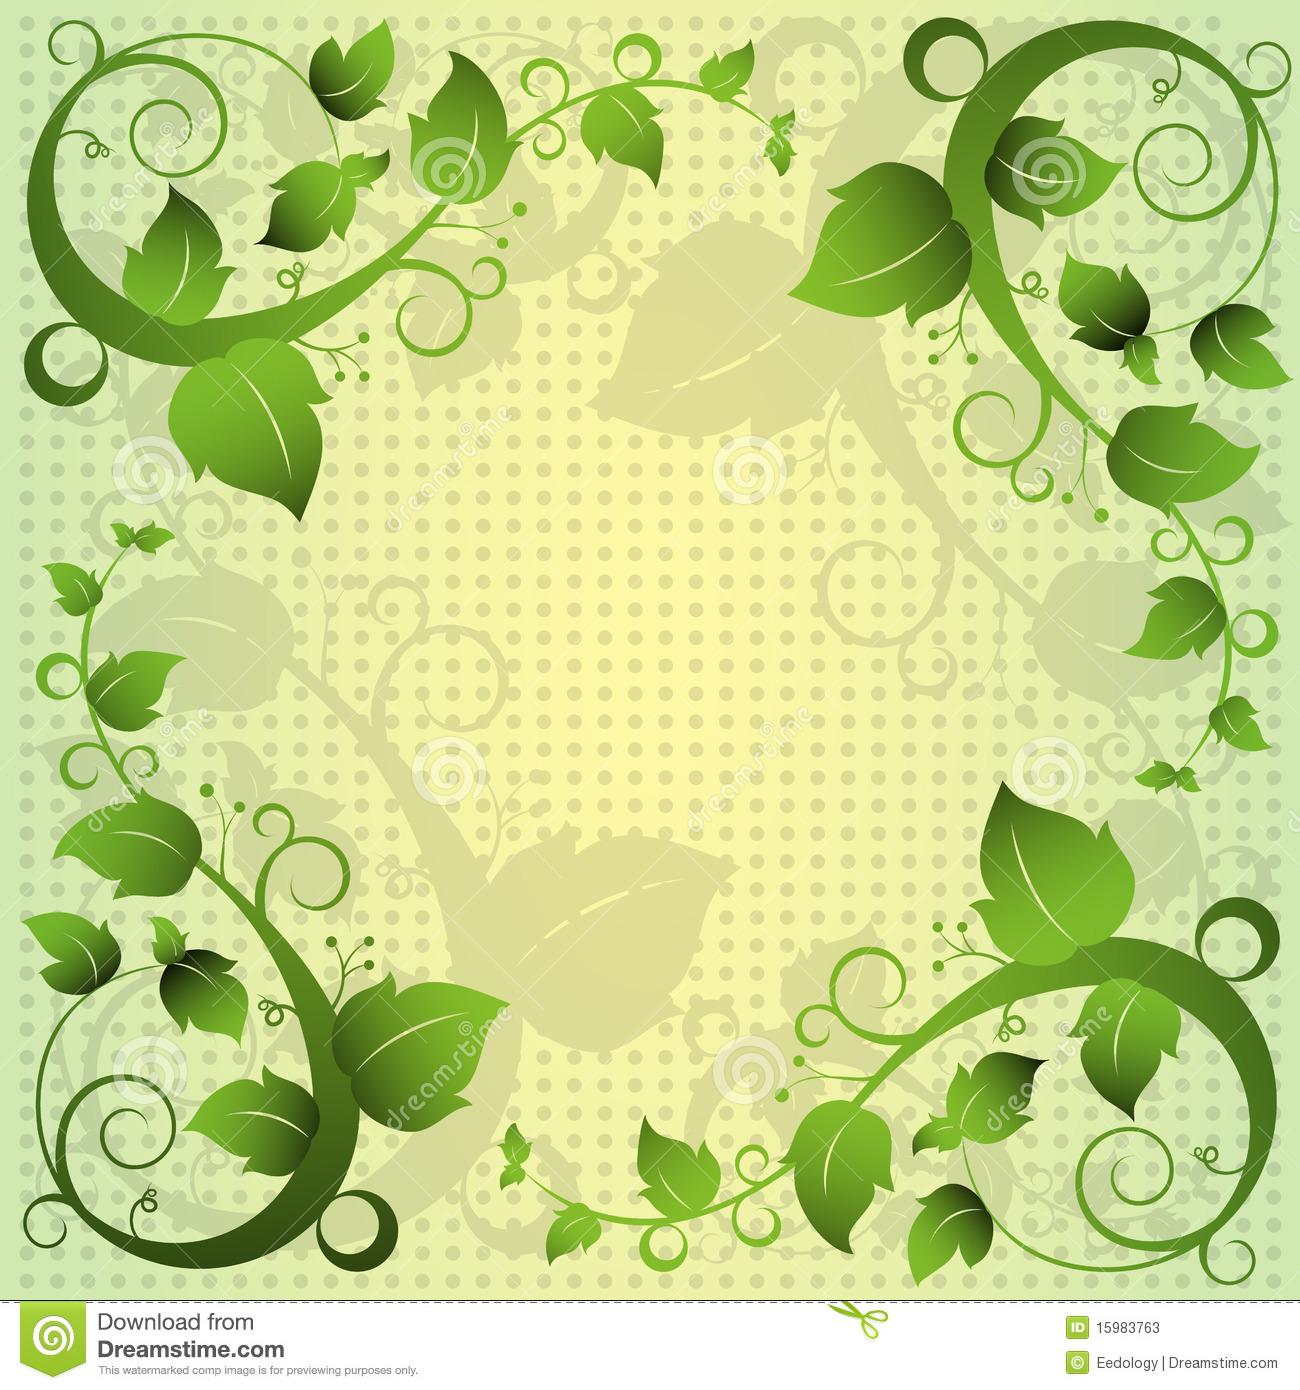 Green Abstract Swirls Border